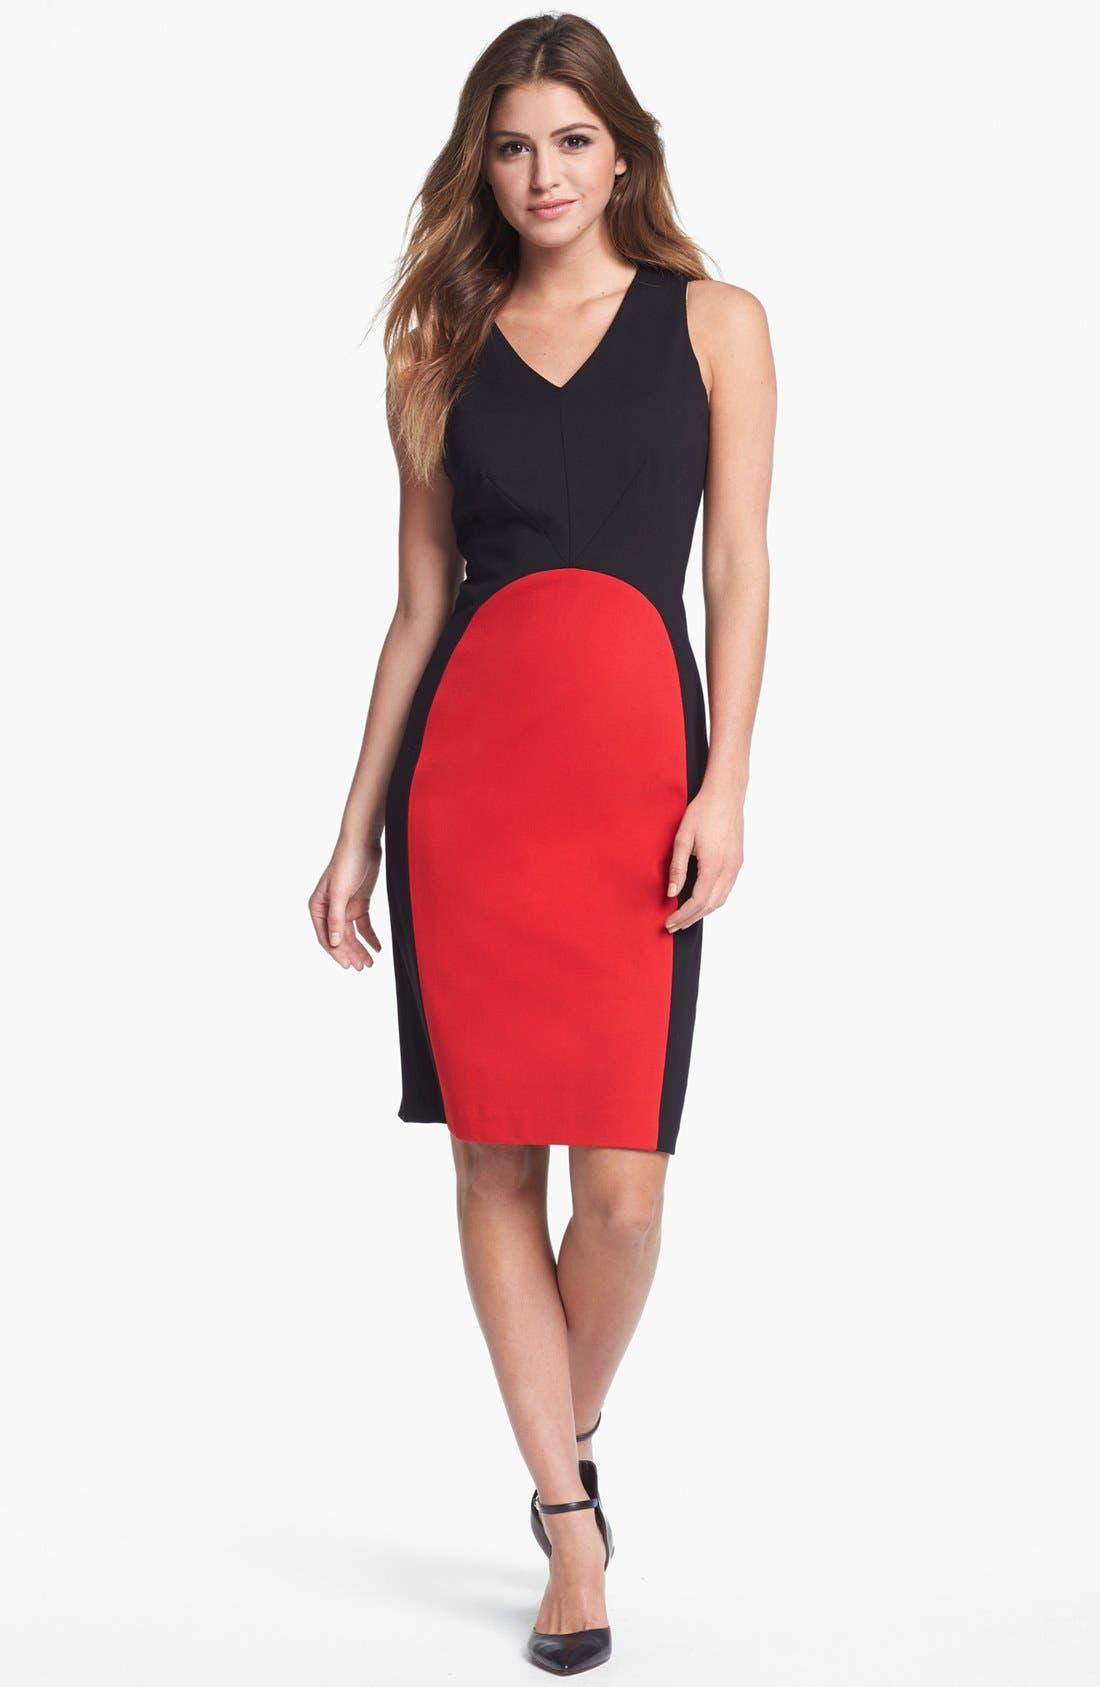 Alternate Image 1 Selected - Vince Camuto Colorblock V-Neck Sheath Dress (Regular & Petite) (Nordstrom Exclusive)